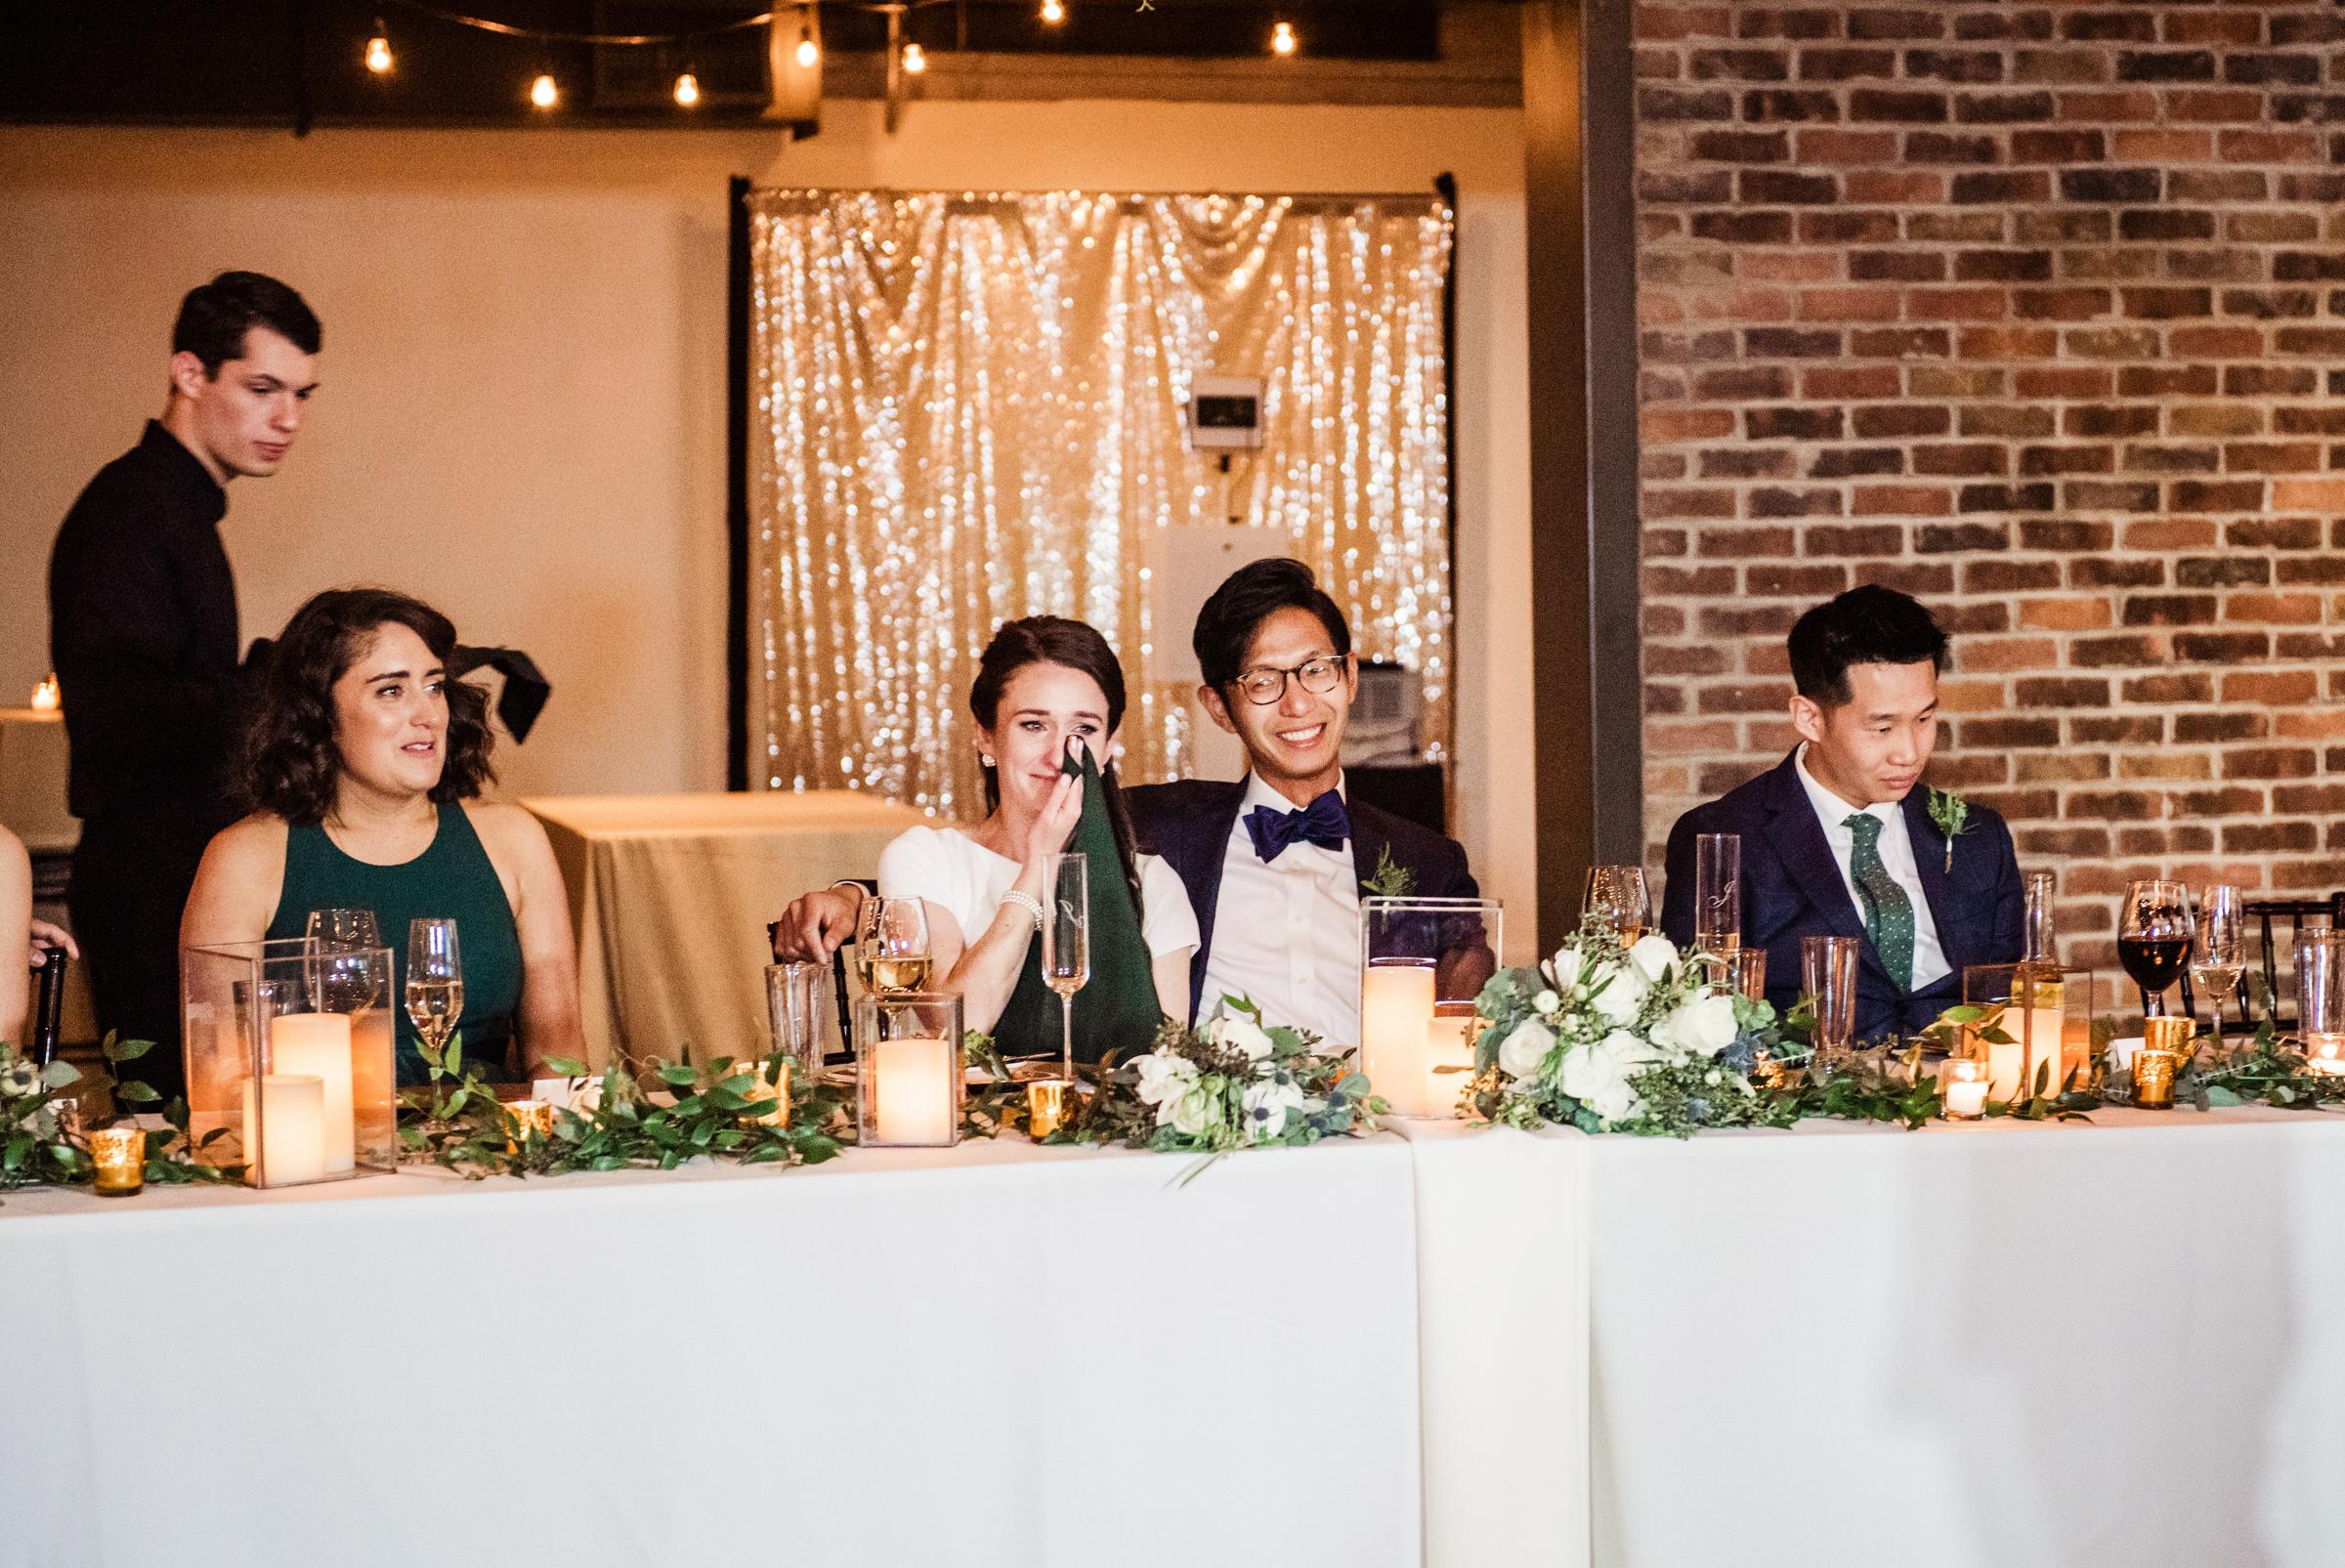 SKY_Armory_Syracuse_Wedding_JILL_STUDIO_Rochester_NY_Photographer_DSC_6182.jpg